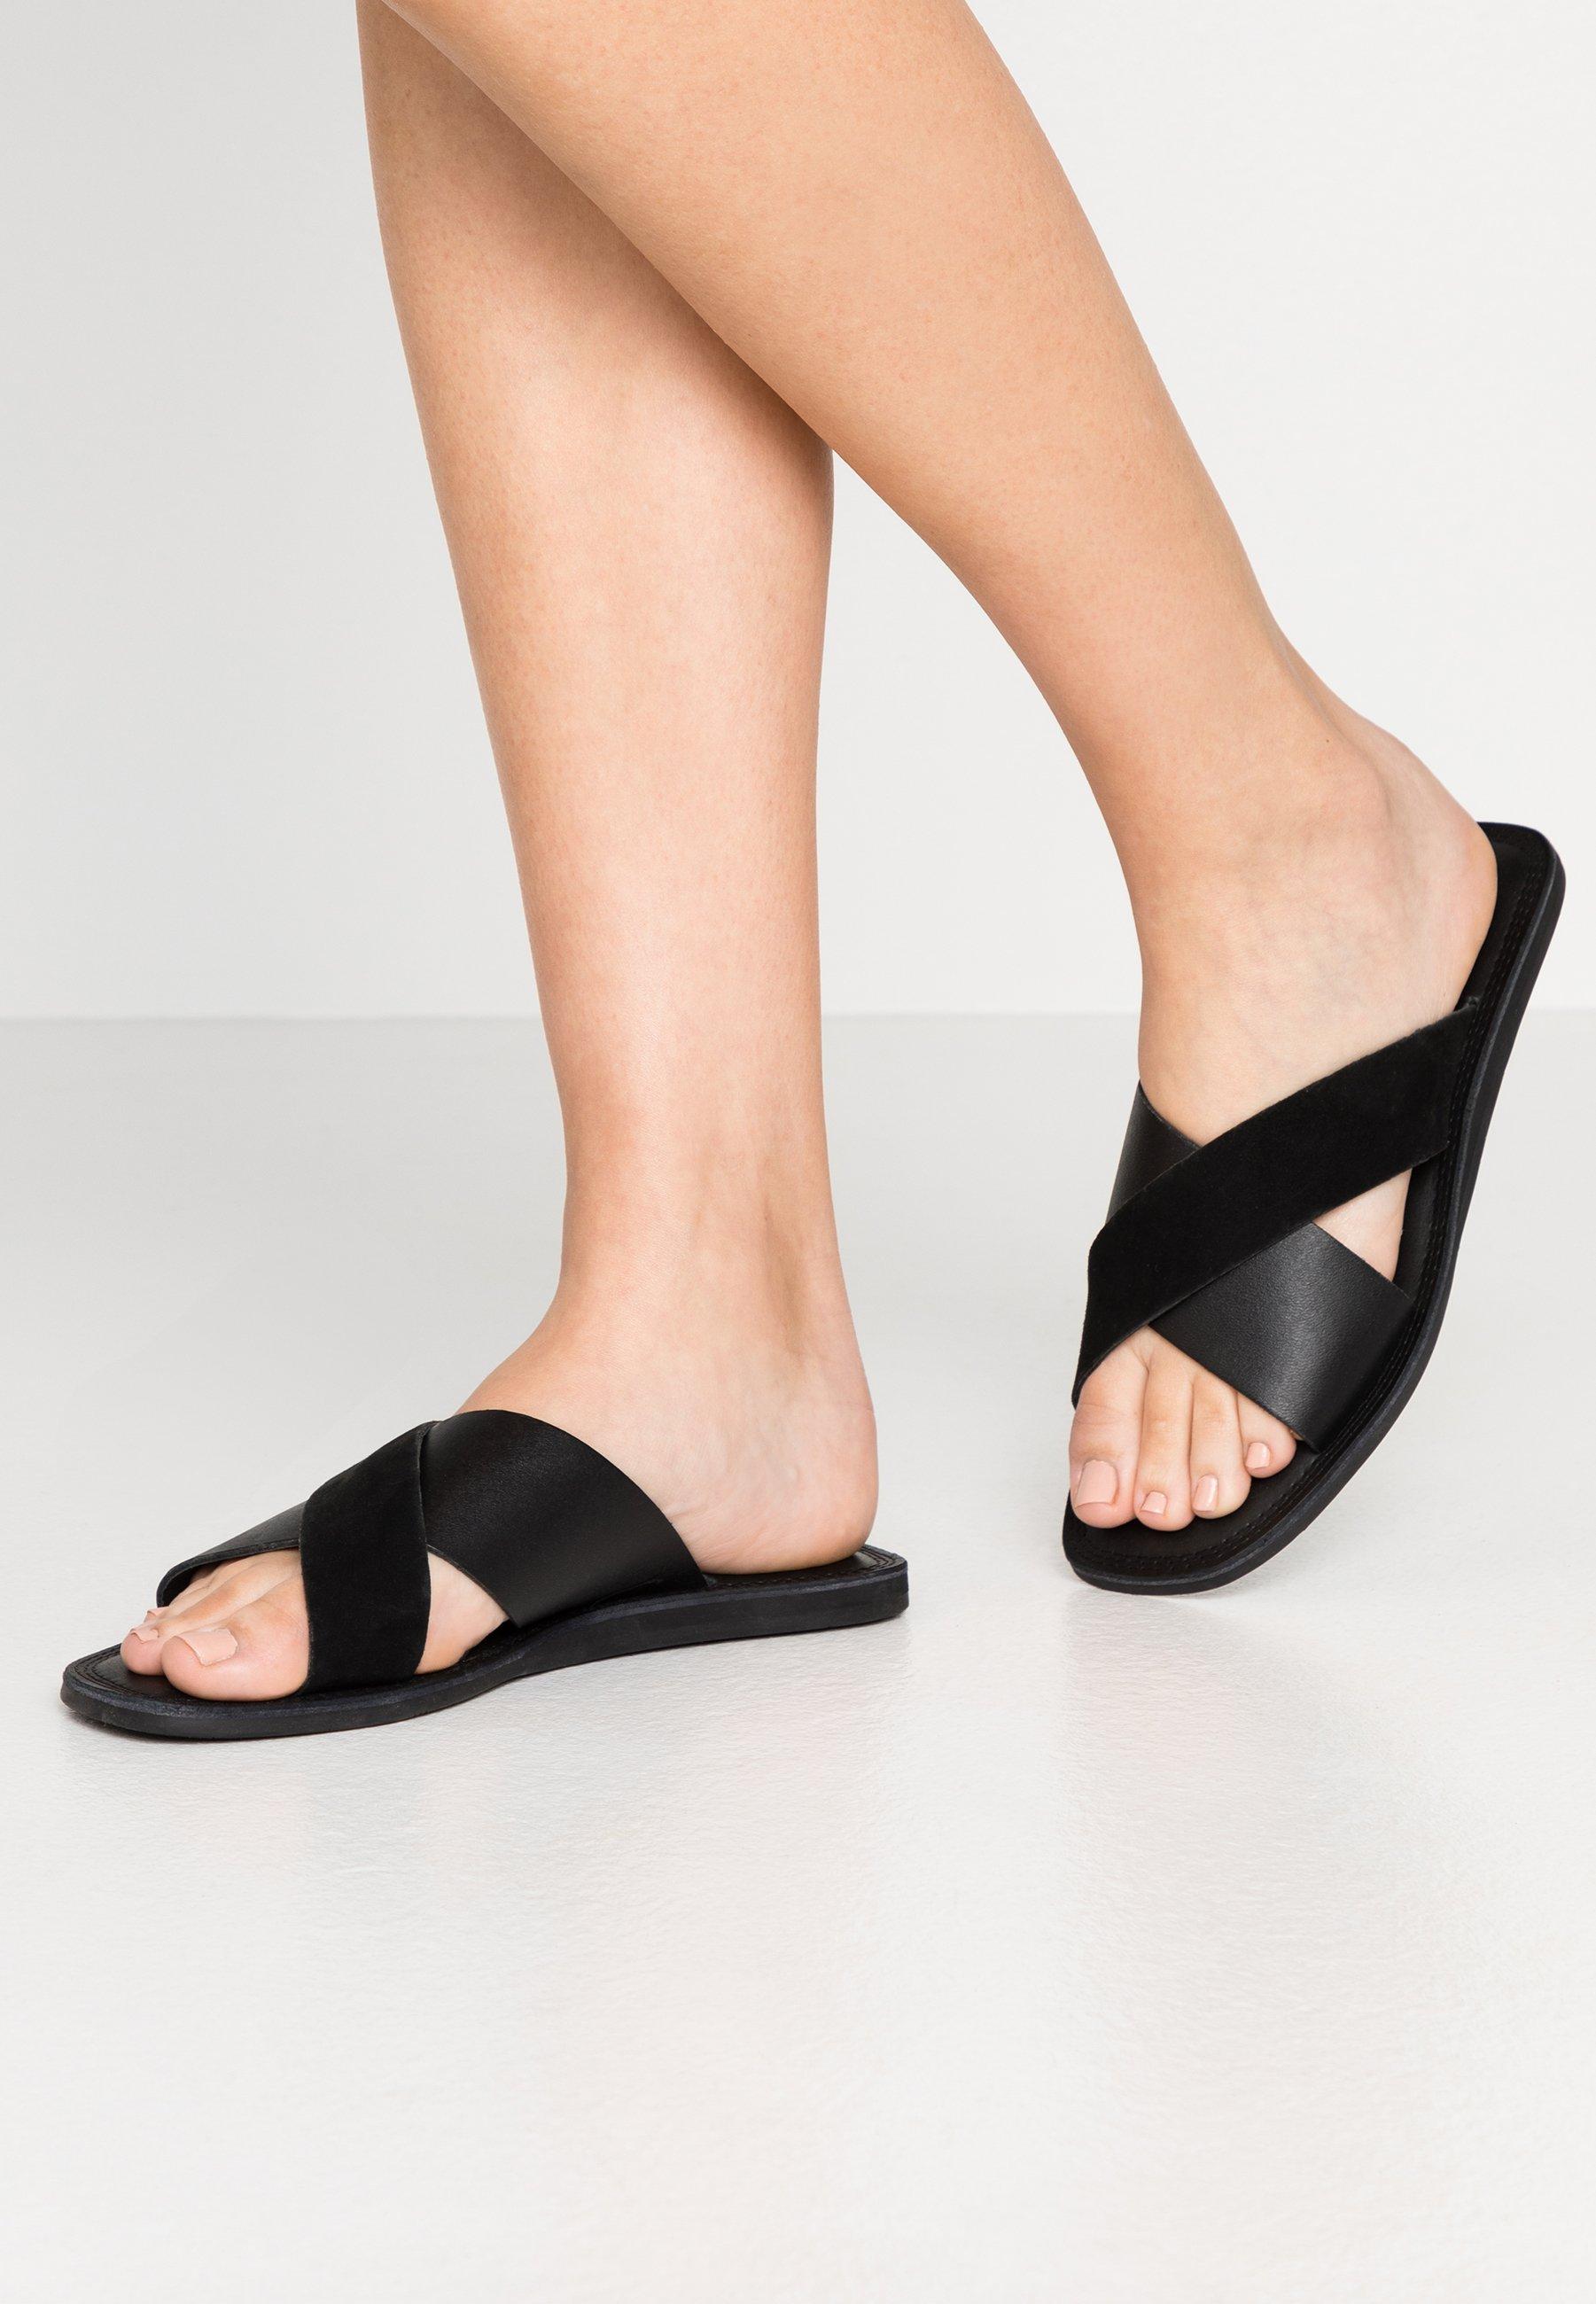 Shoe The Bear TAO SLIDE - Mules - black - Mules & Sabots femme Officiel